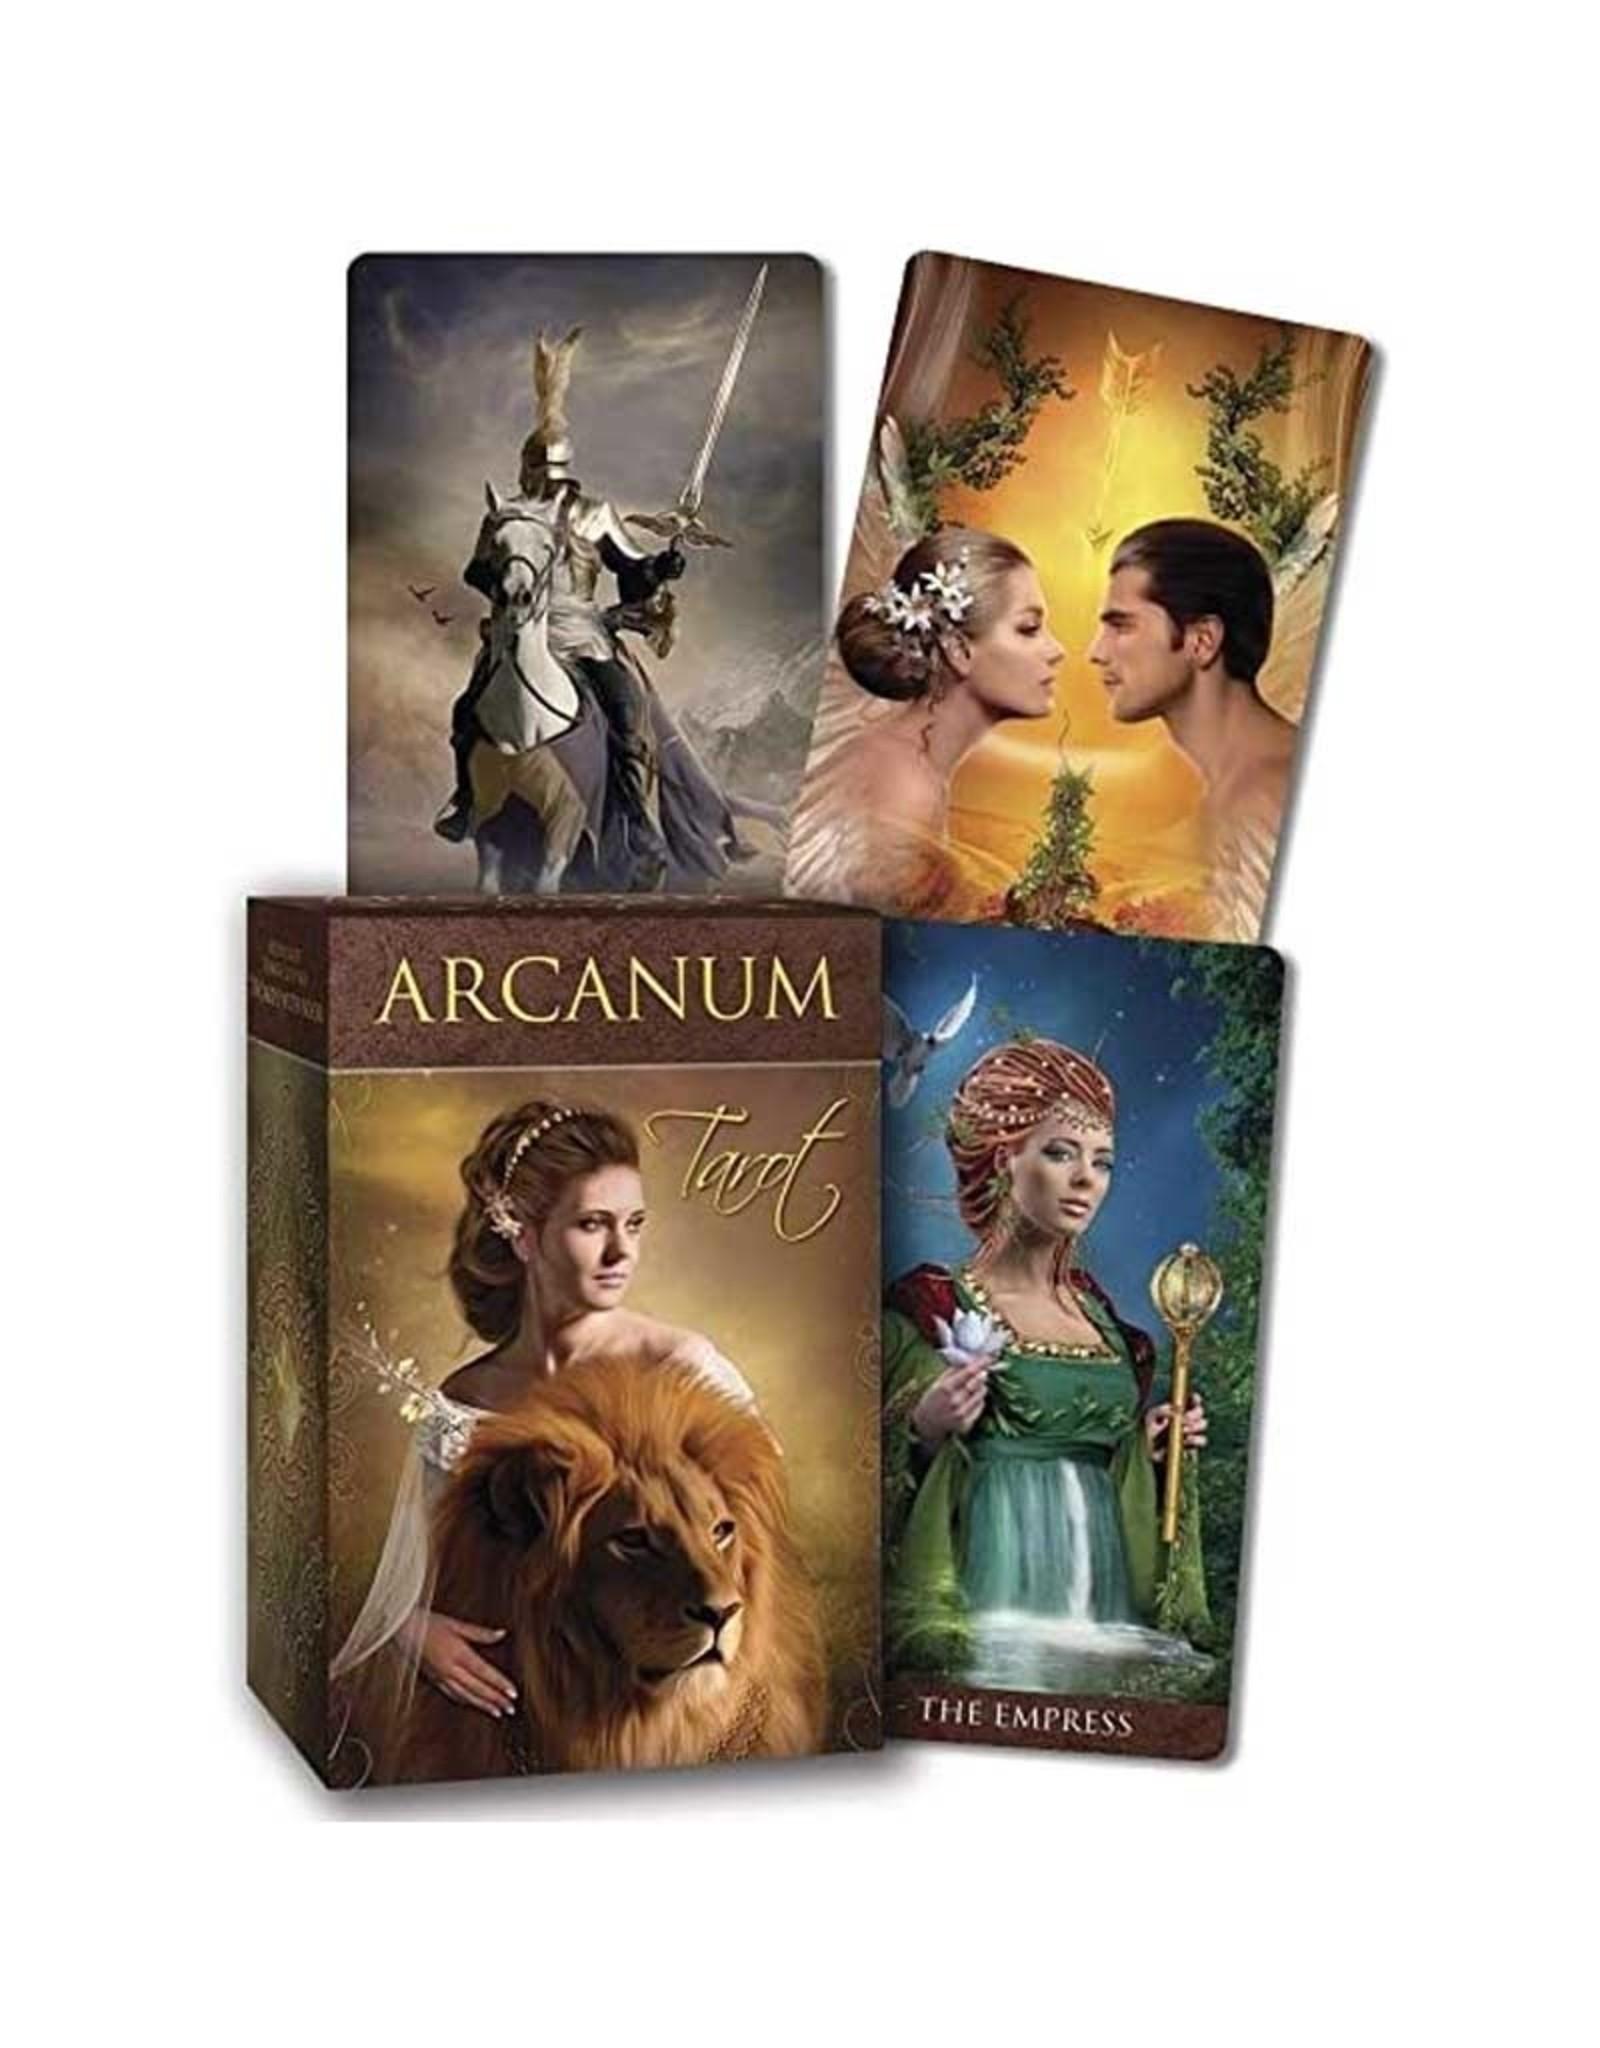 Arcanum Tarot by Renata Lechner